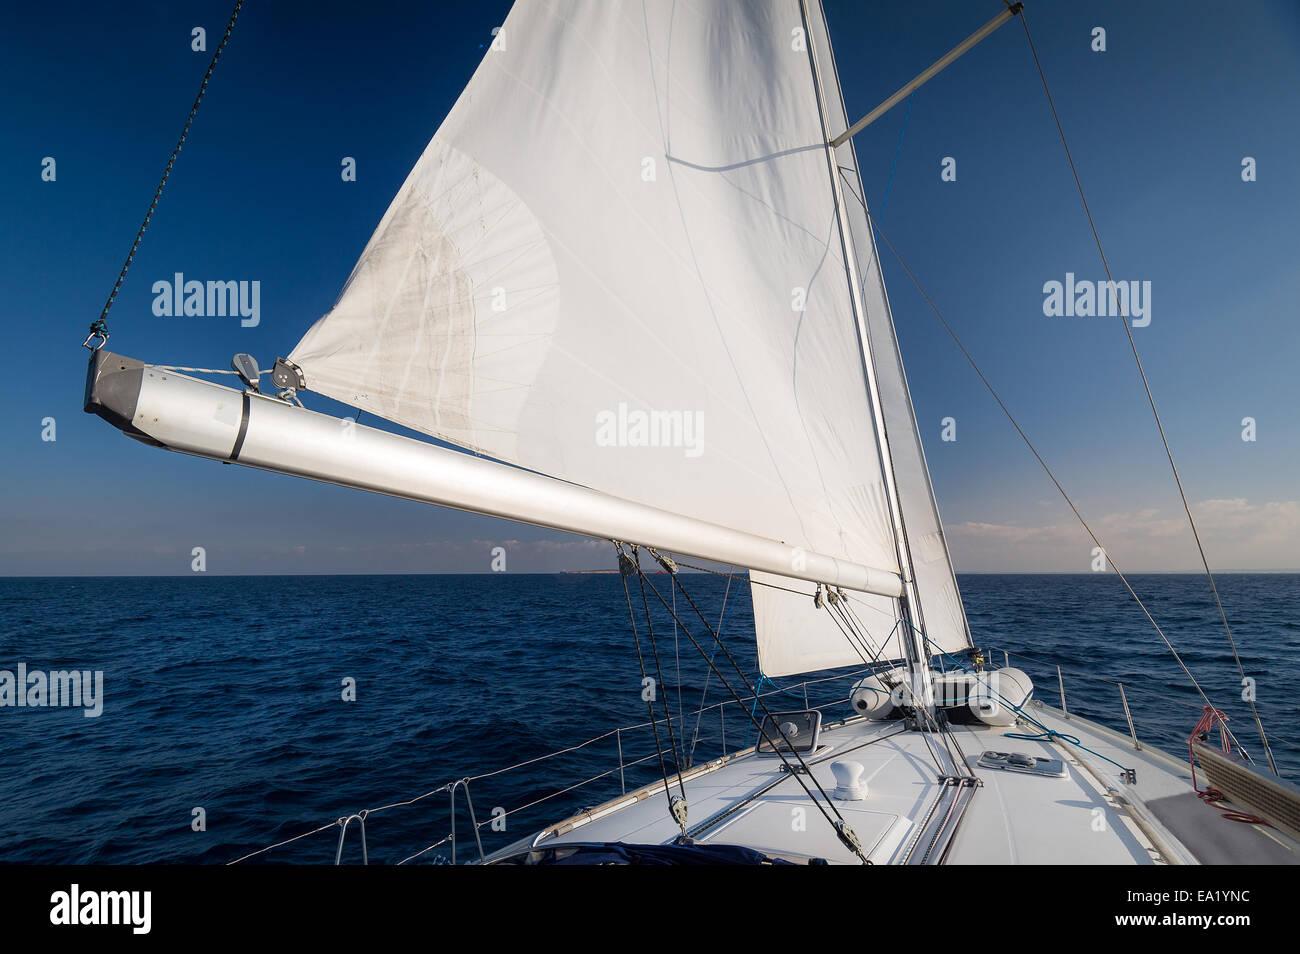 Sailing to the horizon - Stock Image